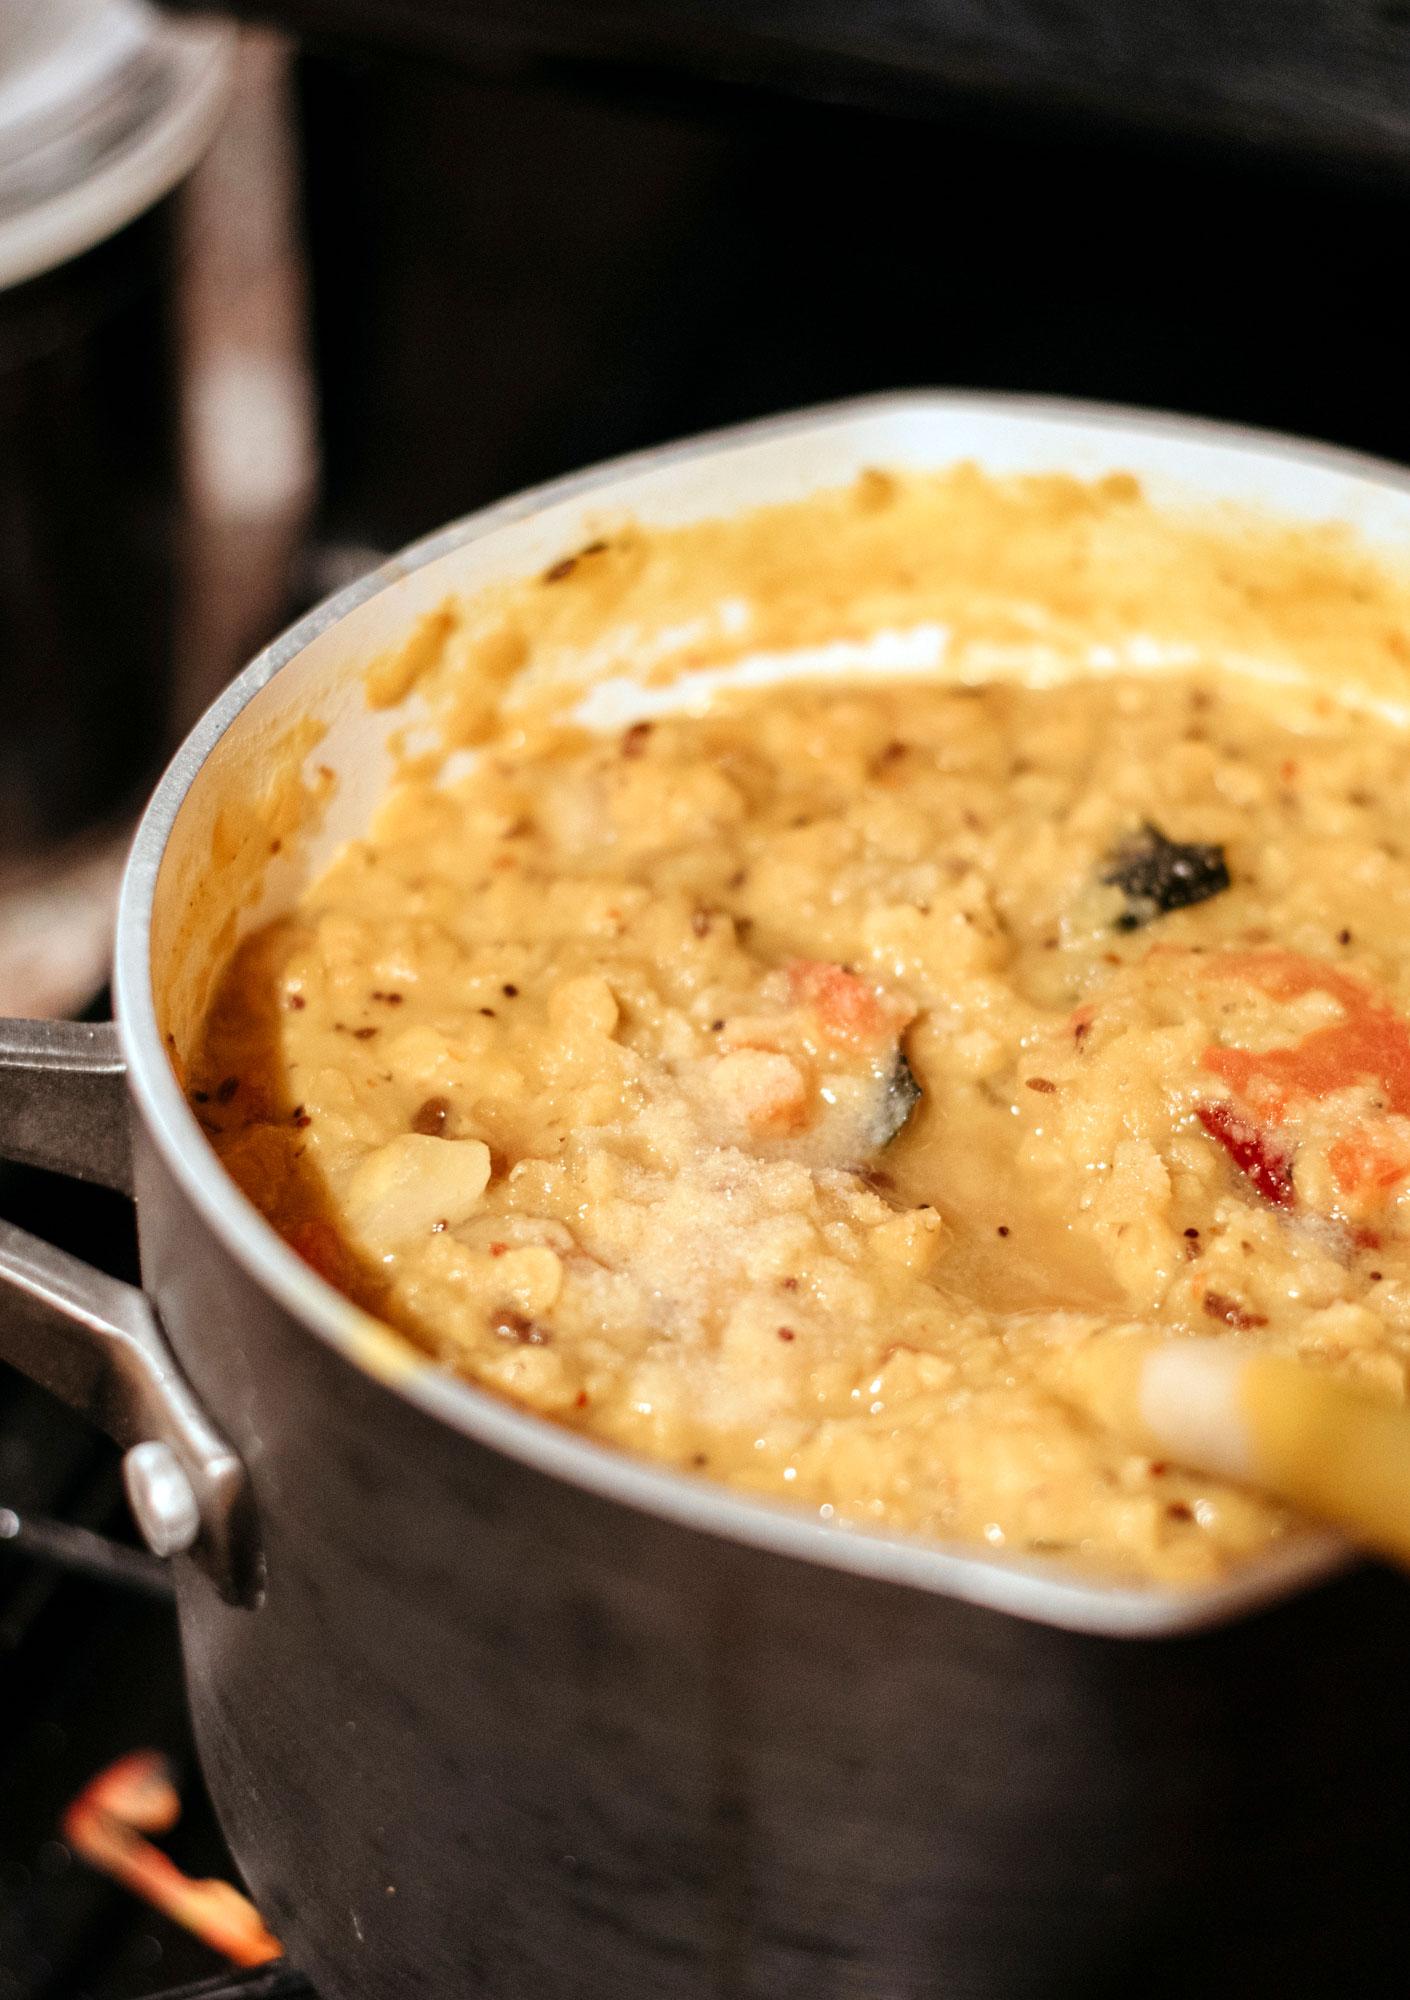 Los_Angeles_Food_photographer_Rebecca_Peloquin_Sri_Lankan_Food_012.JPG